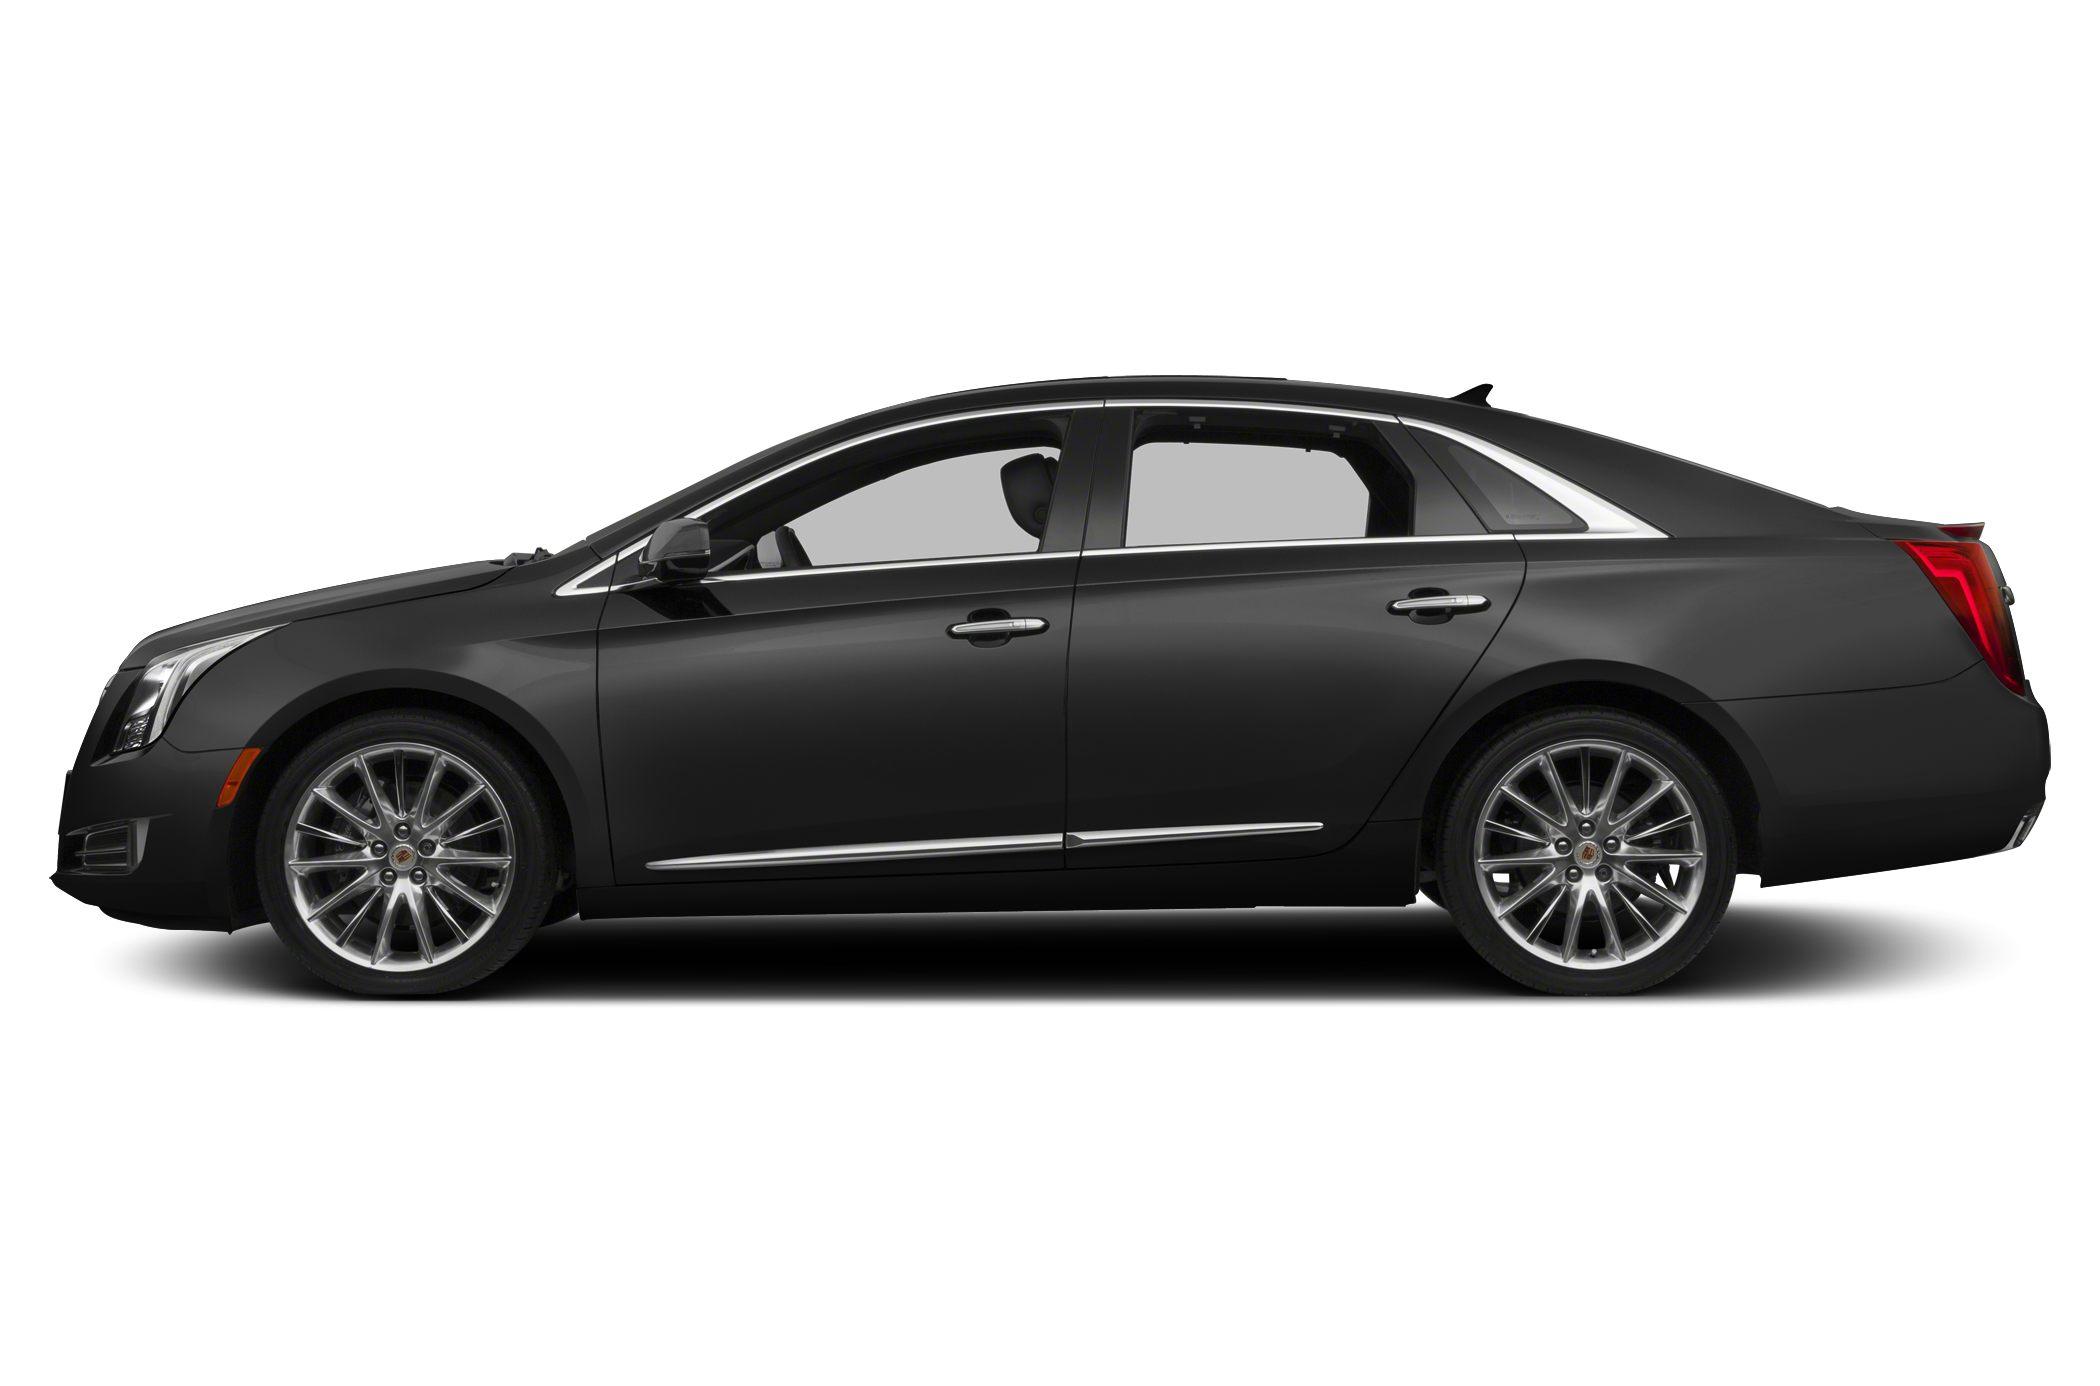 Used Cadillac XTS Luxury Inventory Vehicle Details At Bob - Indiana cadillac dealers